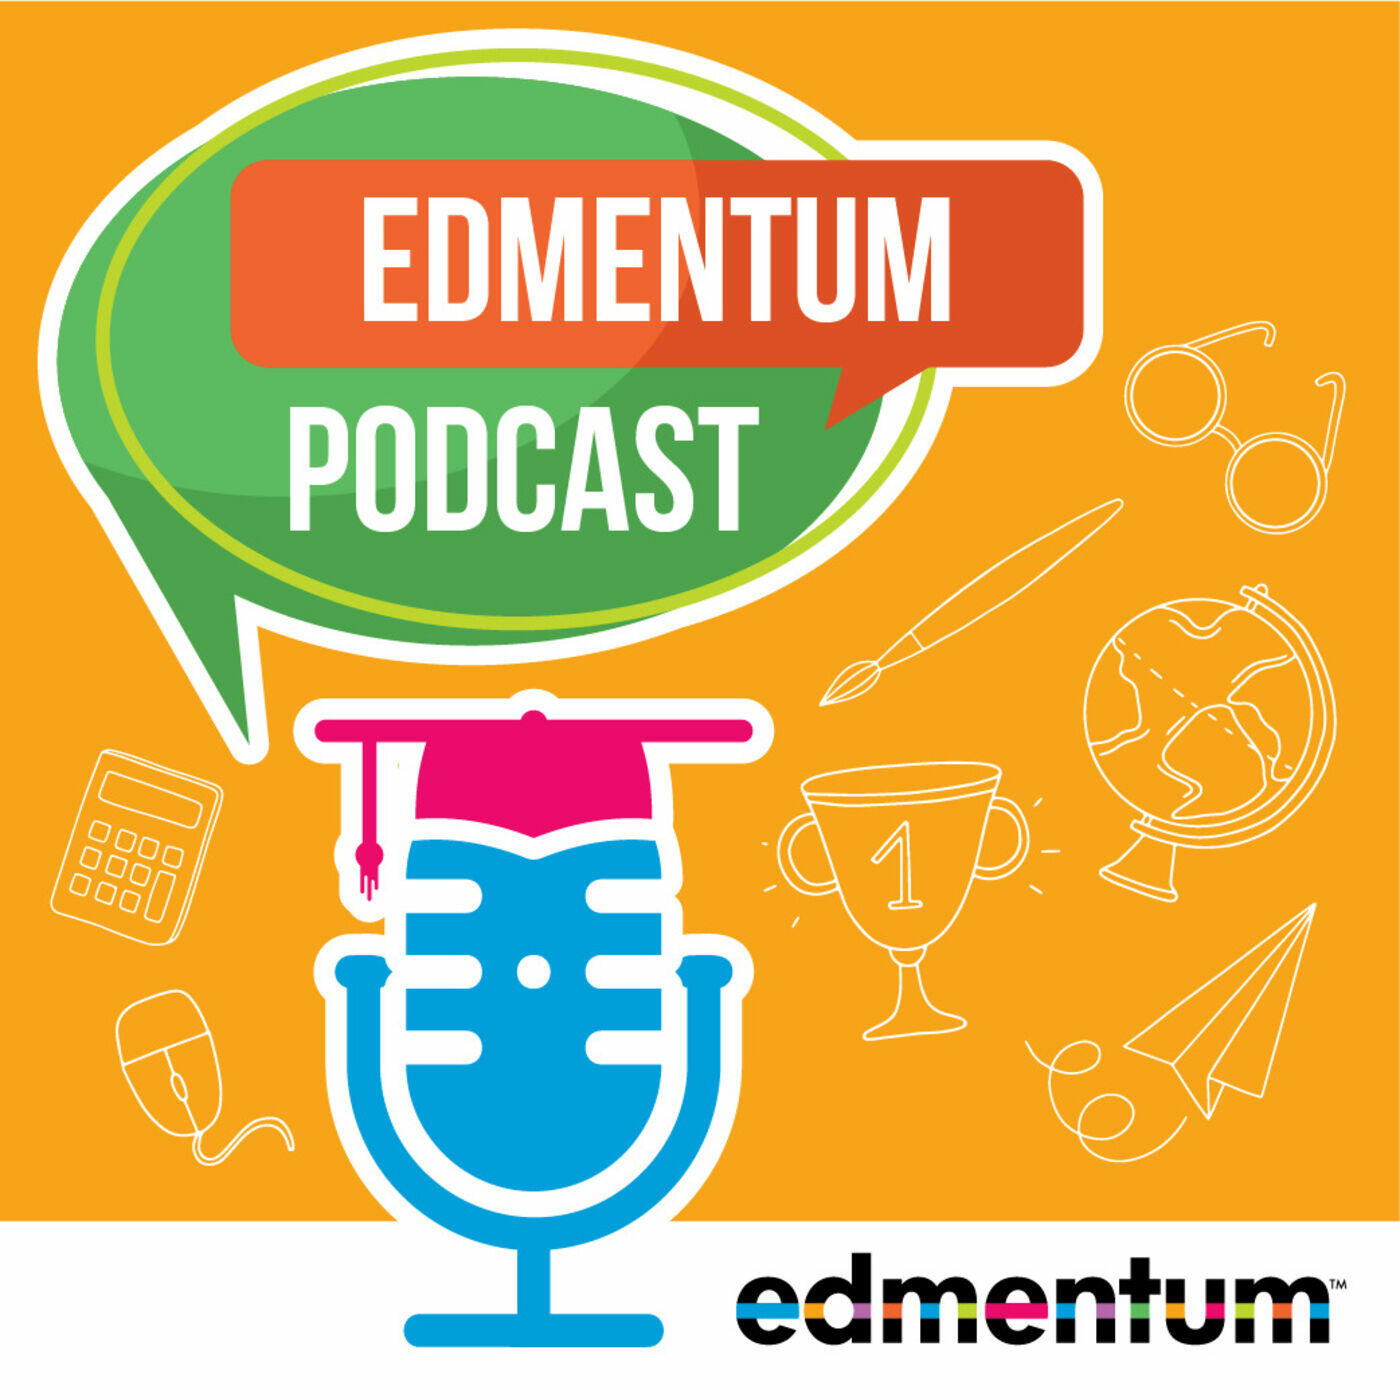 The Edmentum Podcast